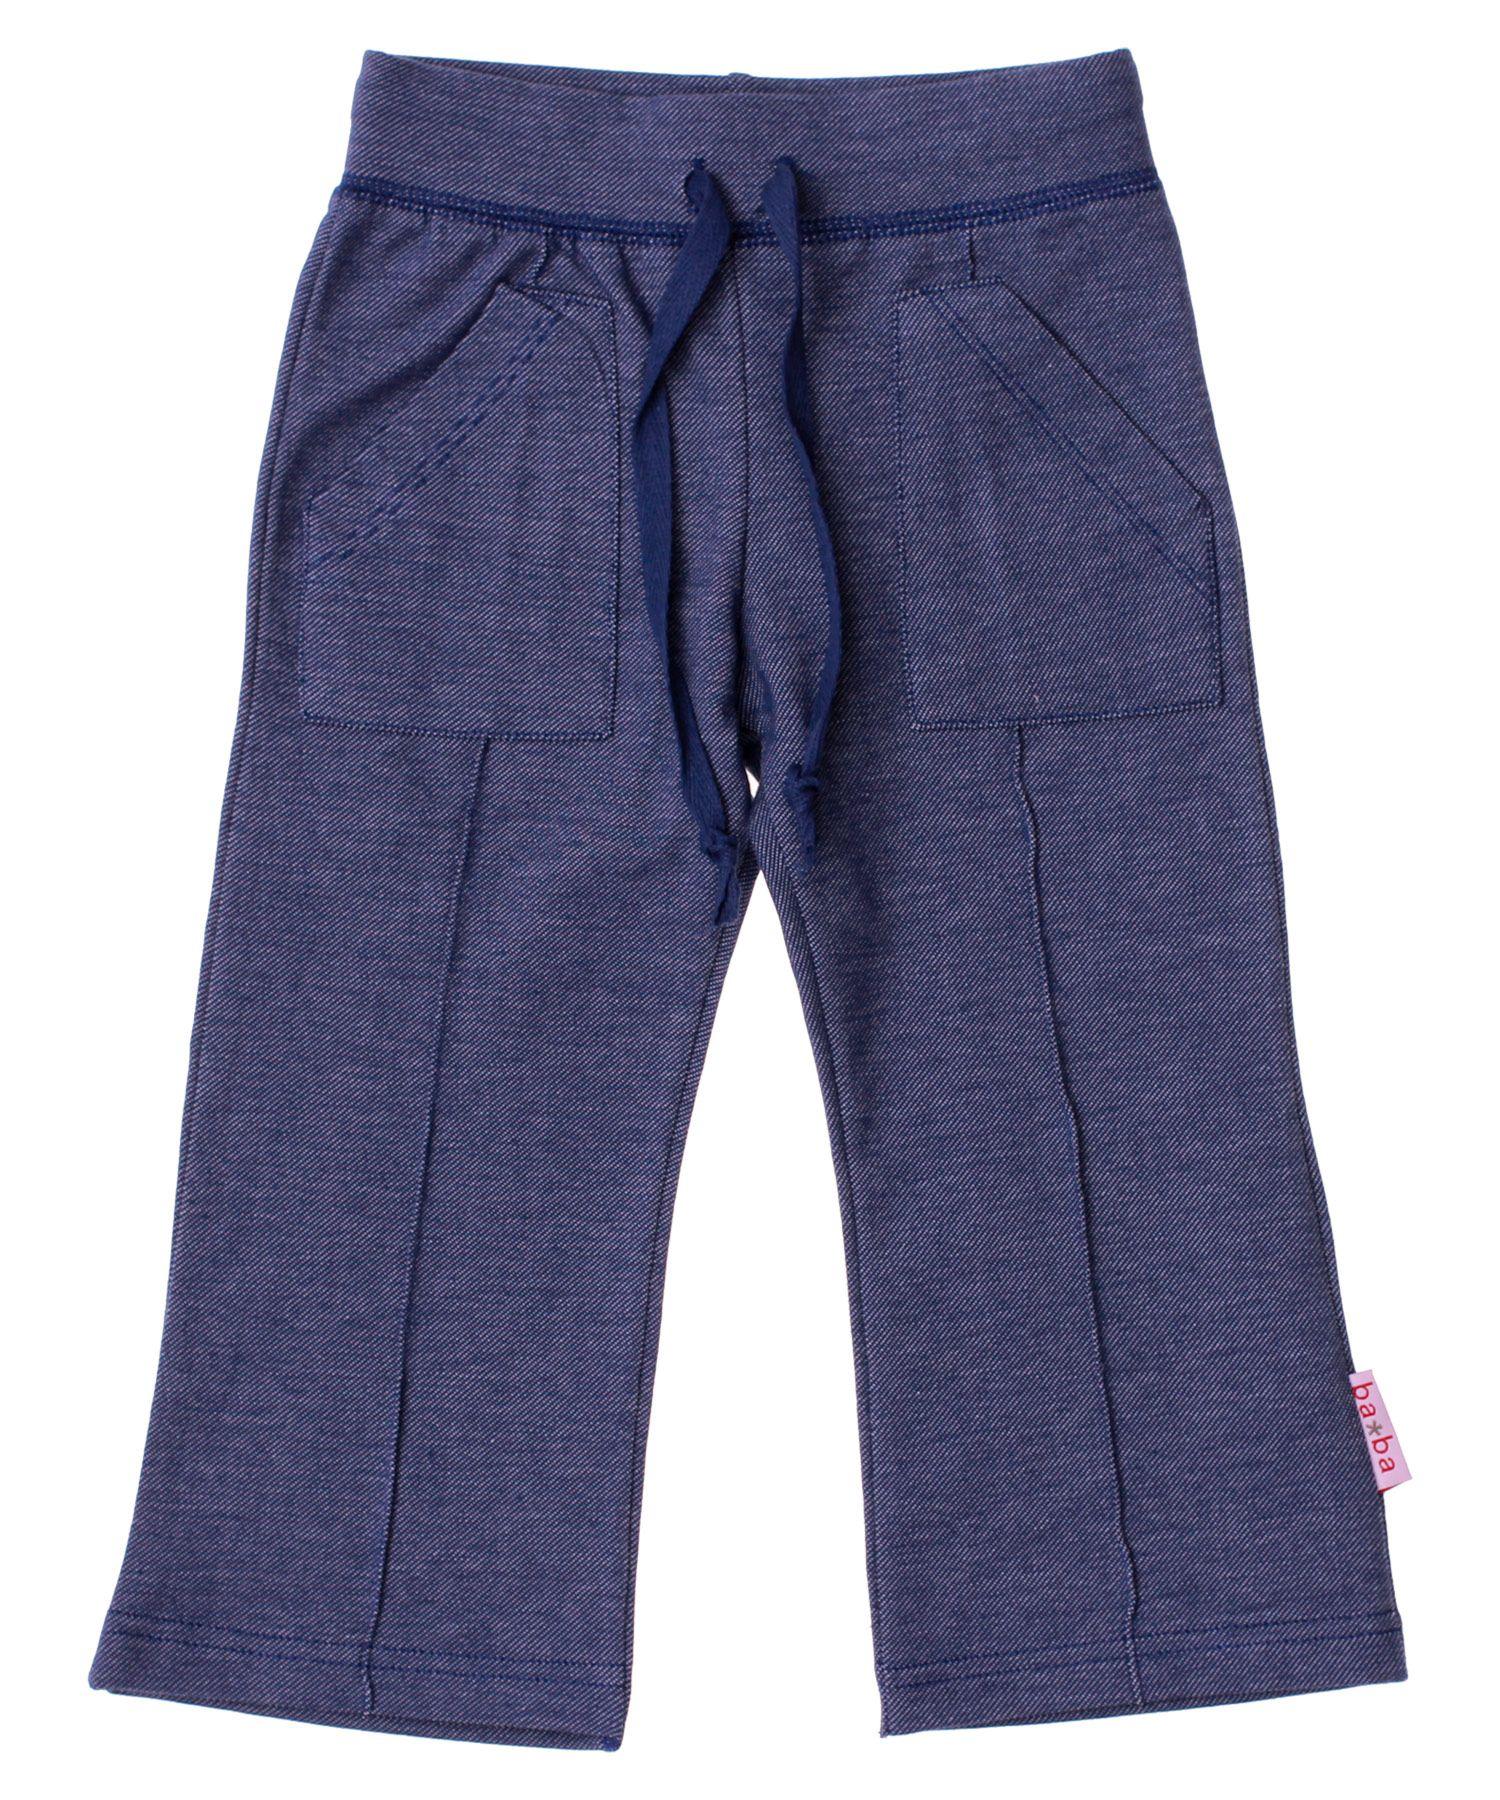 d0473e8b8cd61 Baba Babywear super funky blue milano pocket pants.  baba-babywear.en.emilea.be